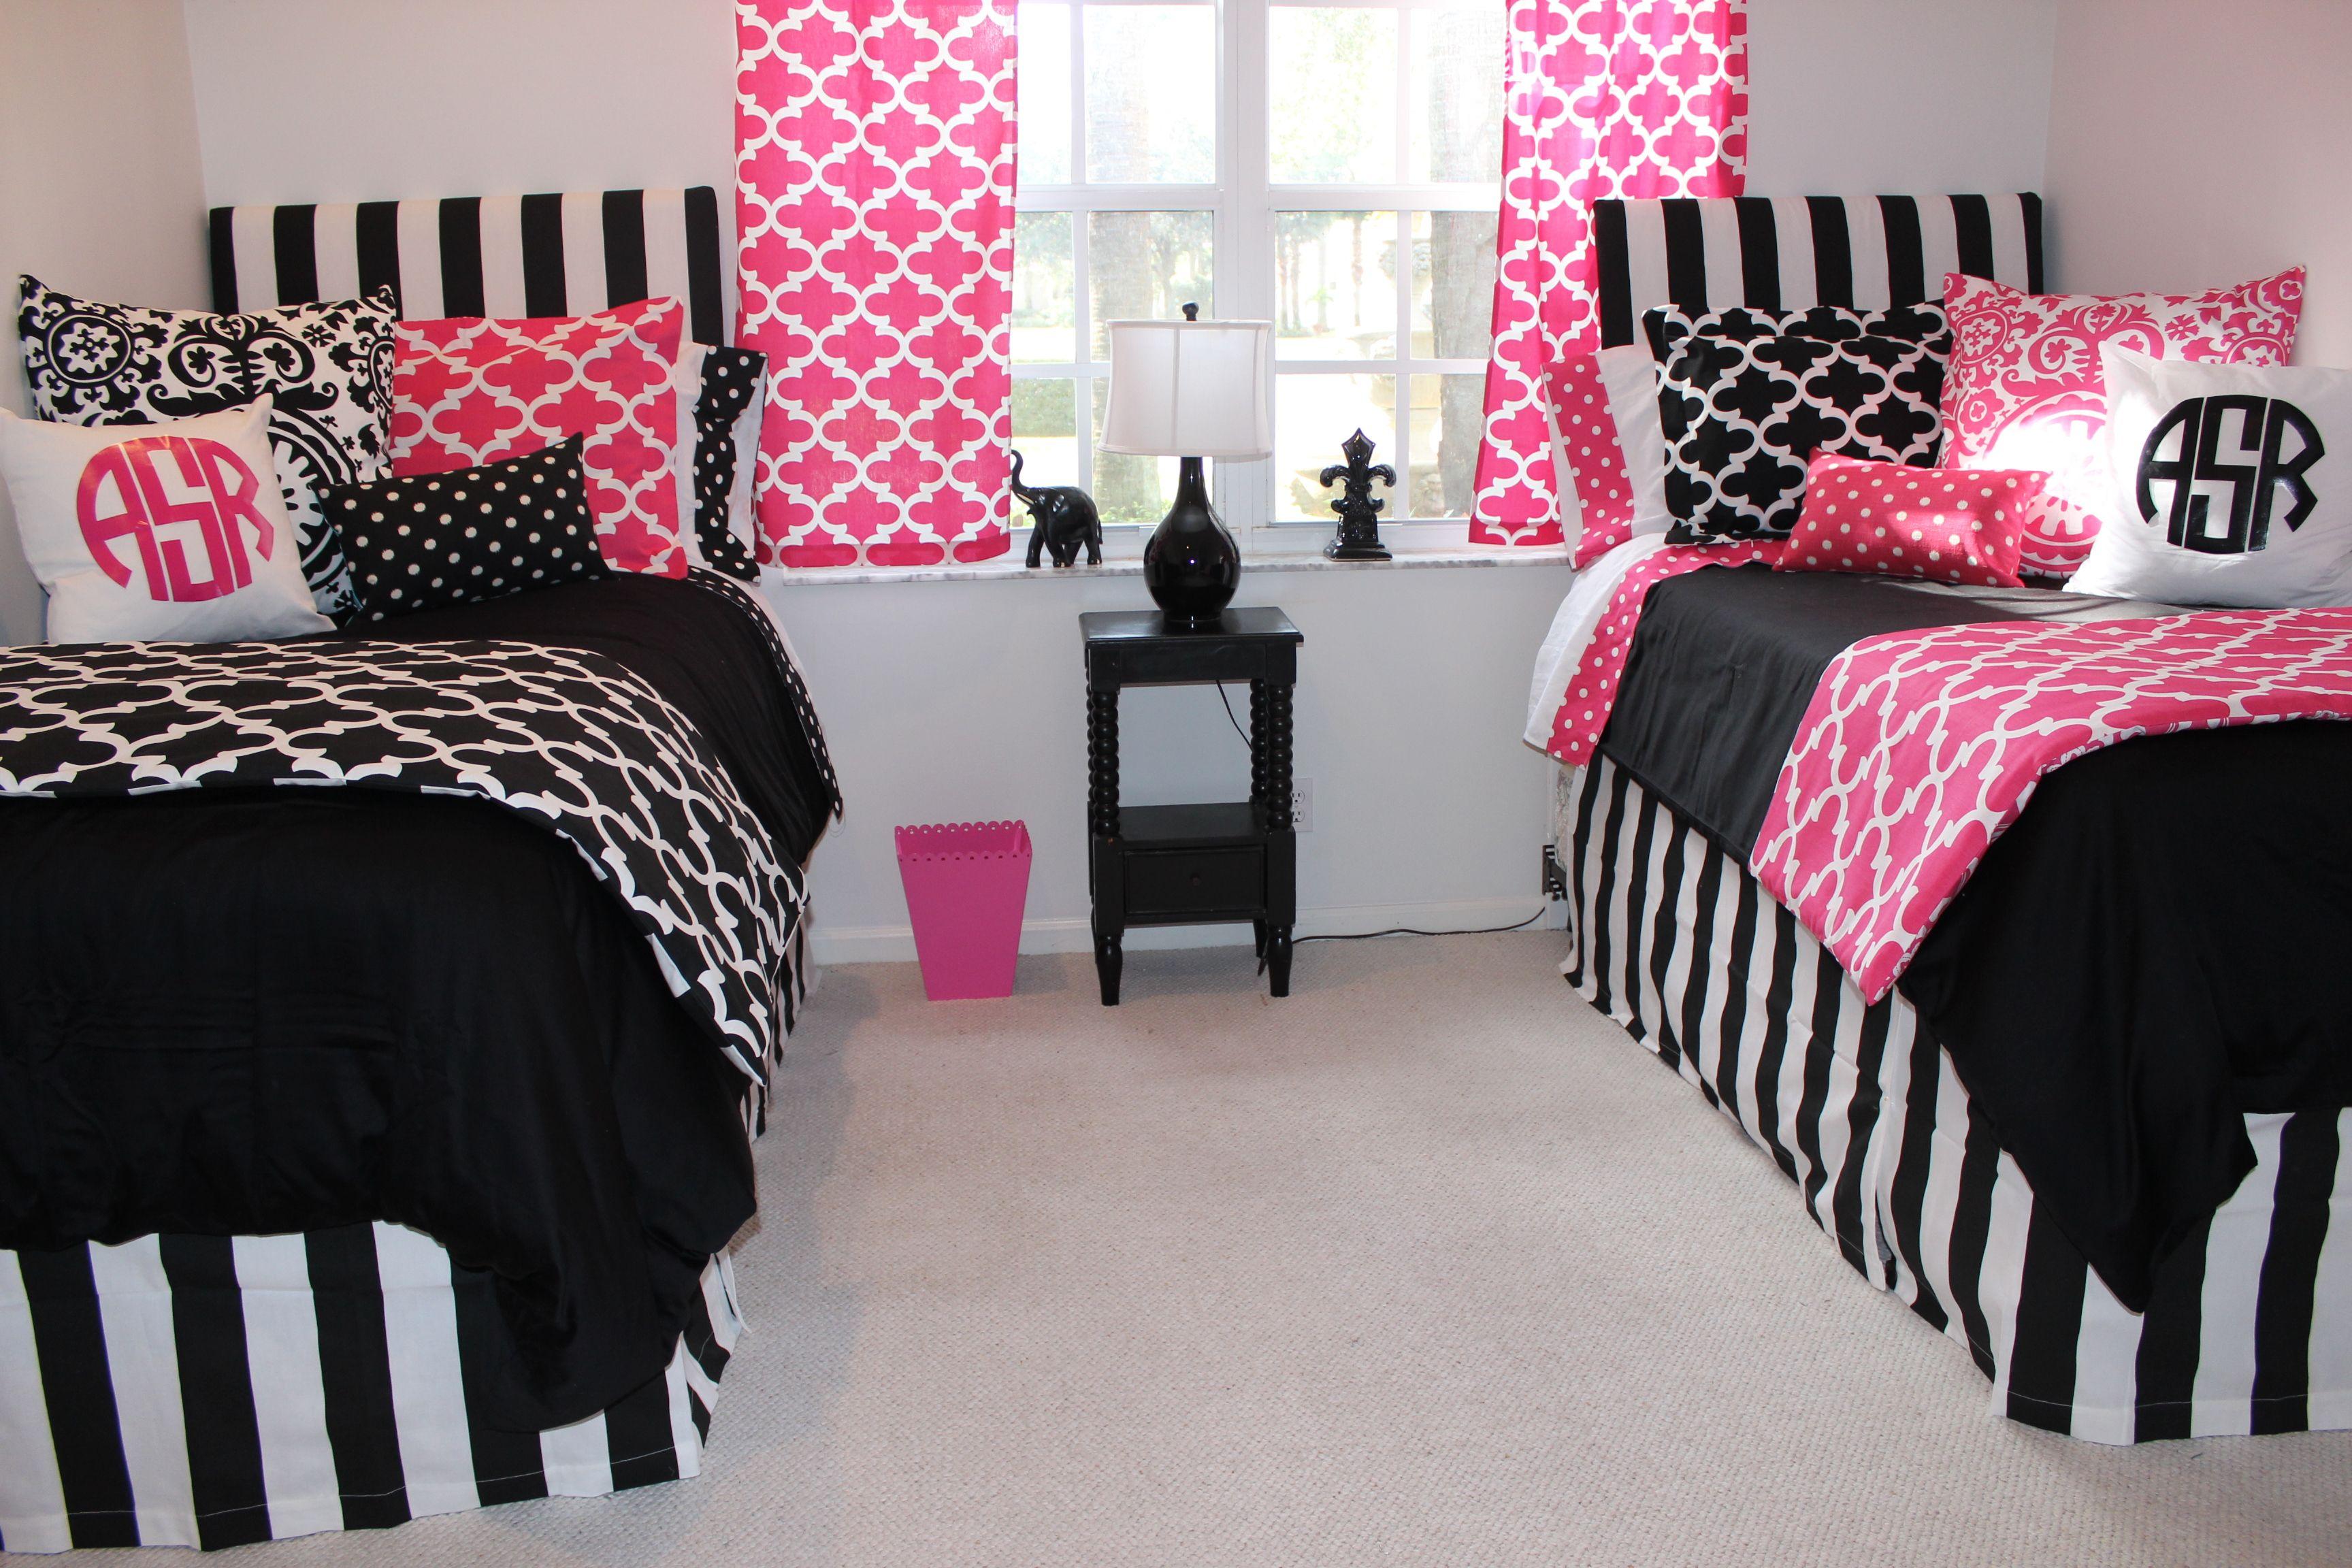 Dorm room ideas for girls two beds - Hot Pink And Black Dorm Room Bedding Design Matching Dorm Room Dormroom2014 Designer Dorm Ideas